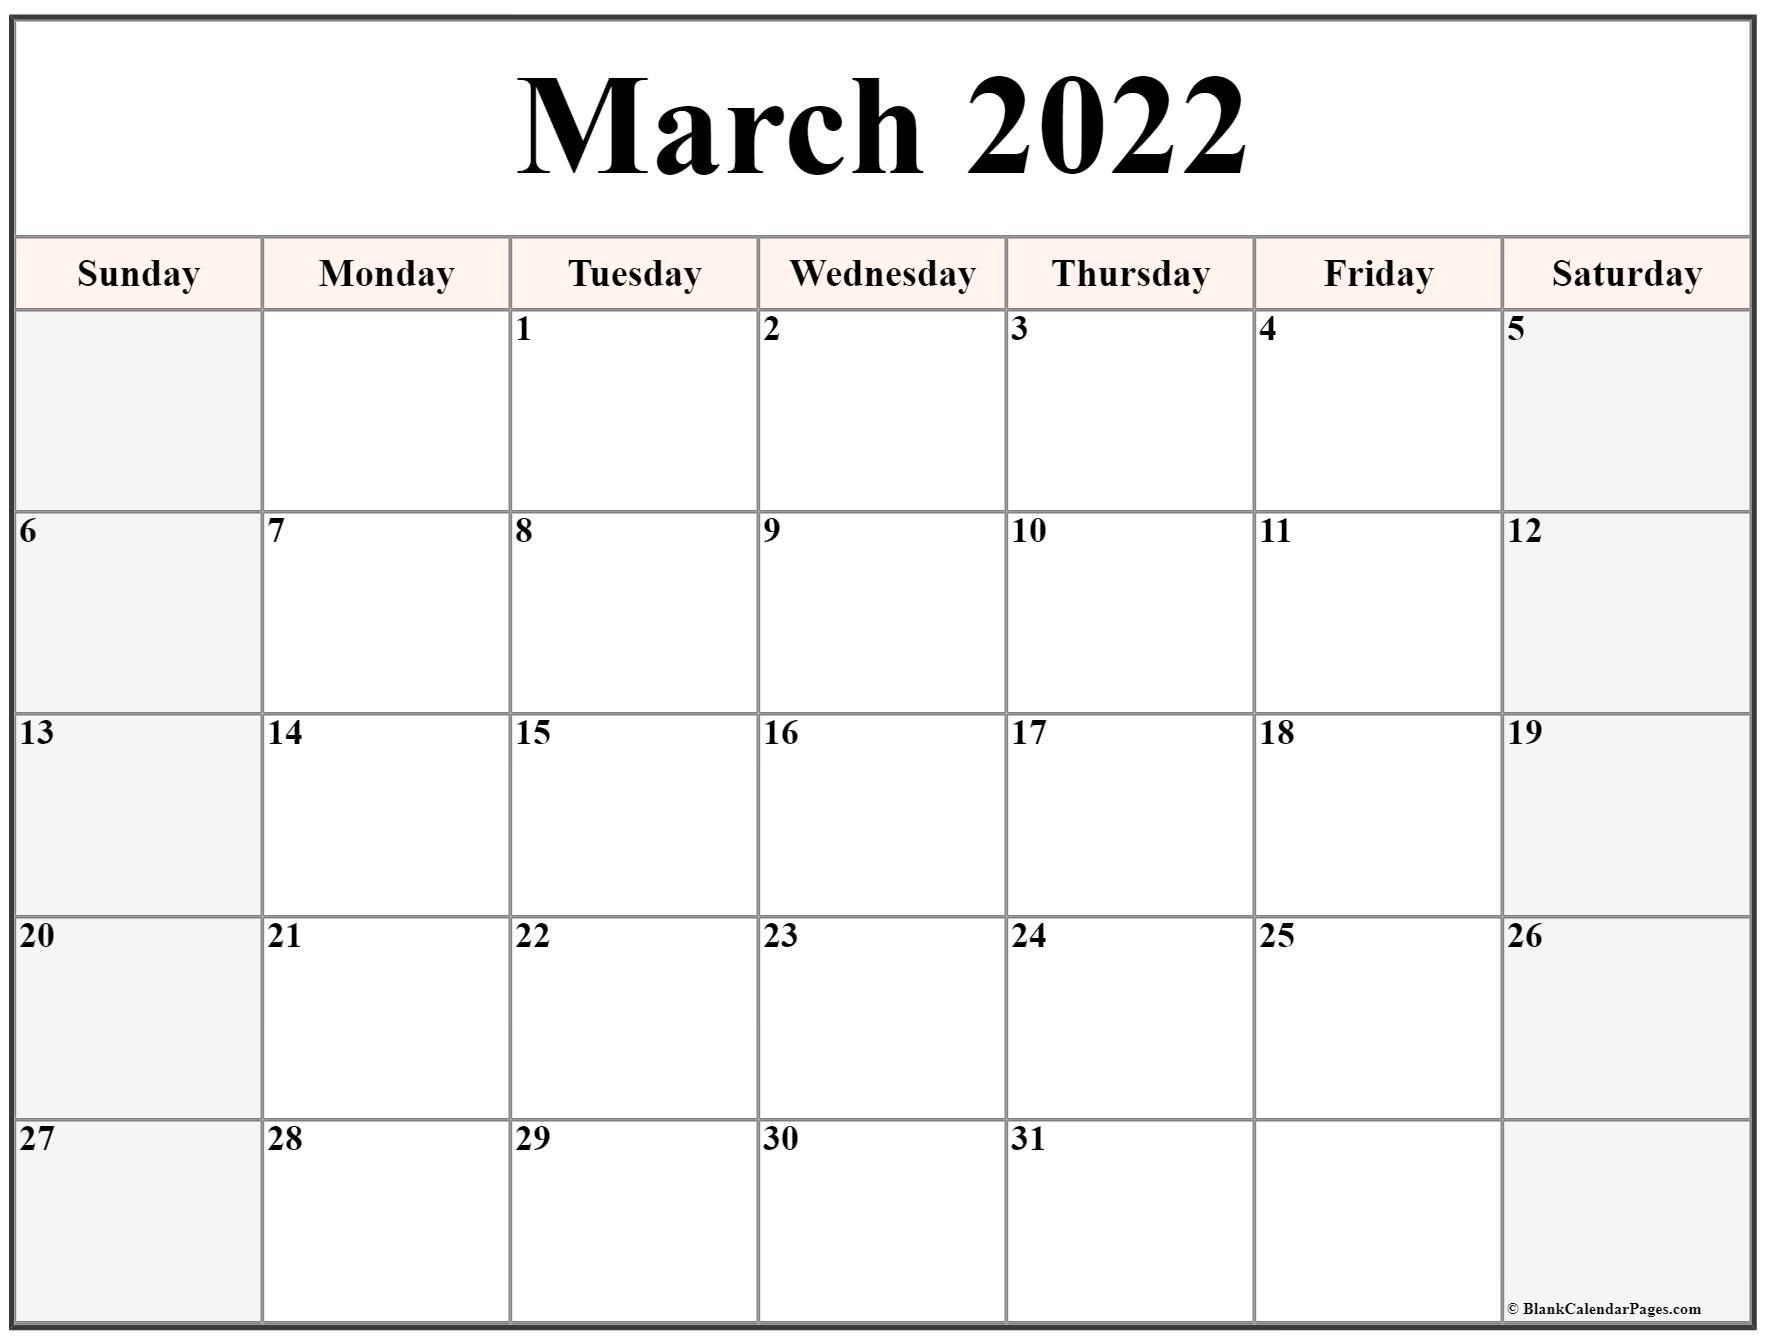 March 2022 Calendar | Free Printable Calendar Templates Throughout 2022 March 2 Page Printable Calendar